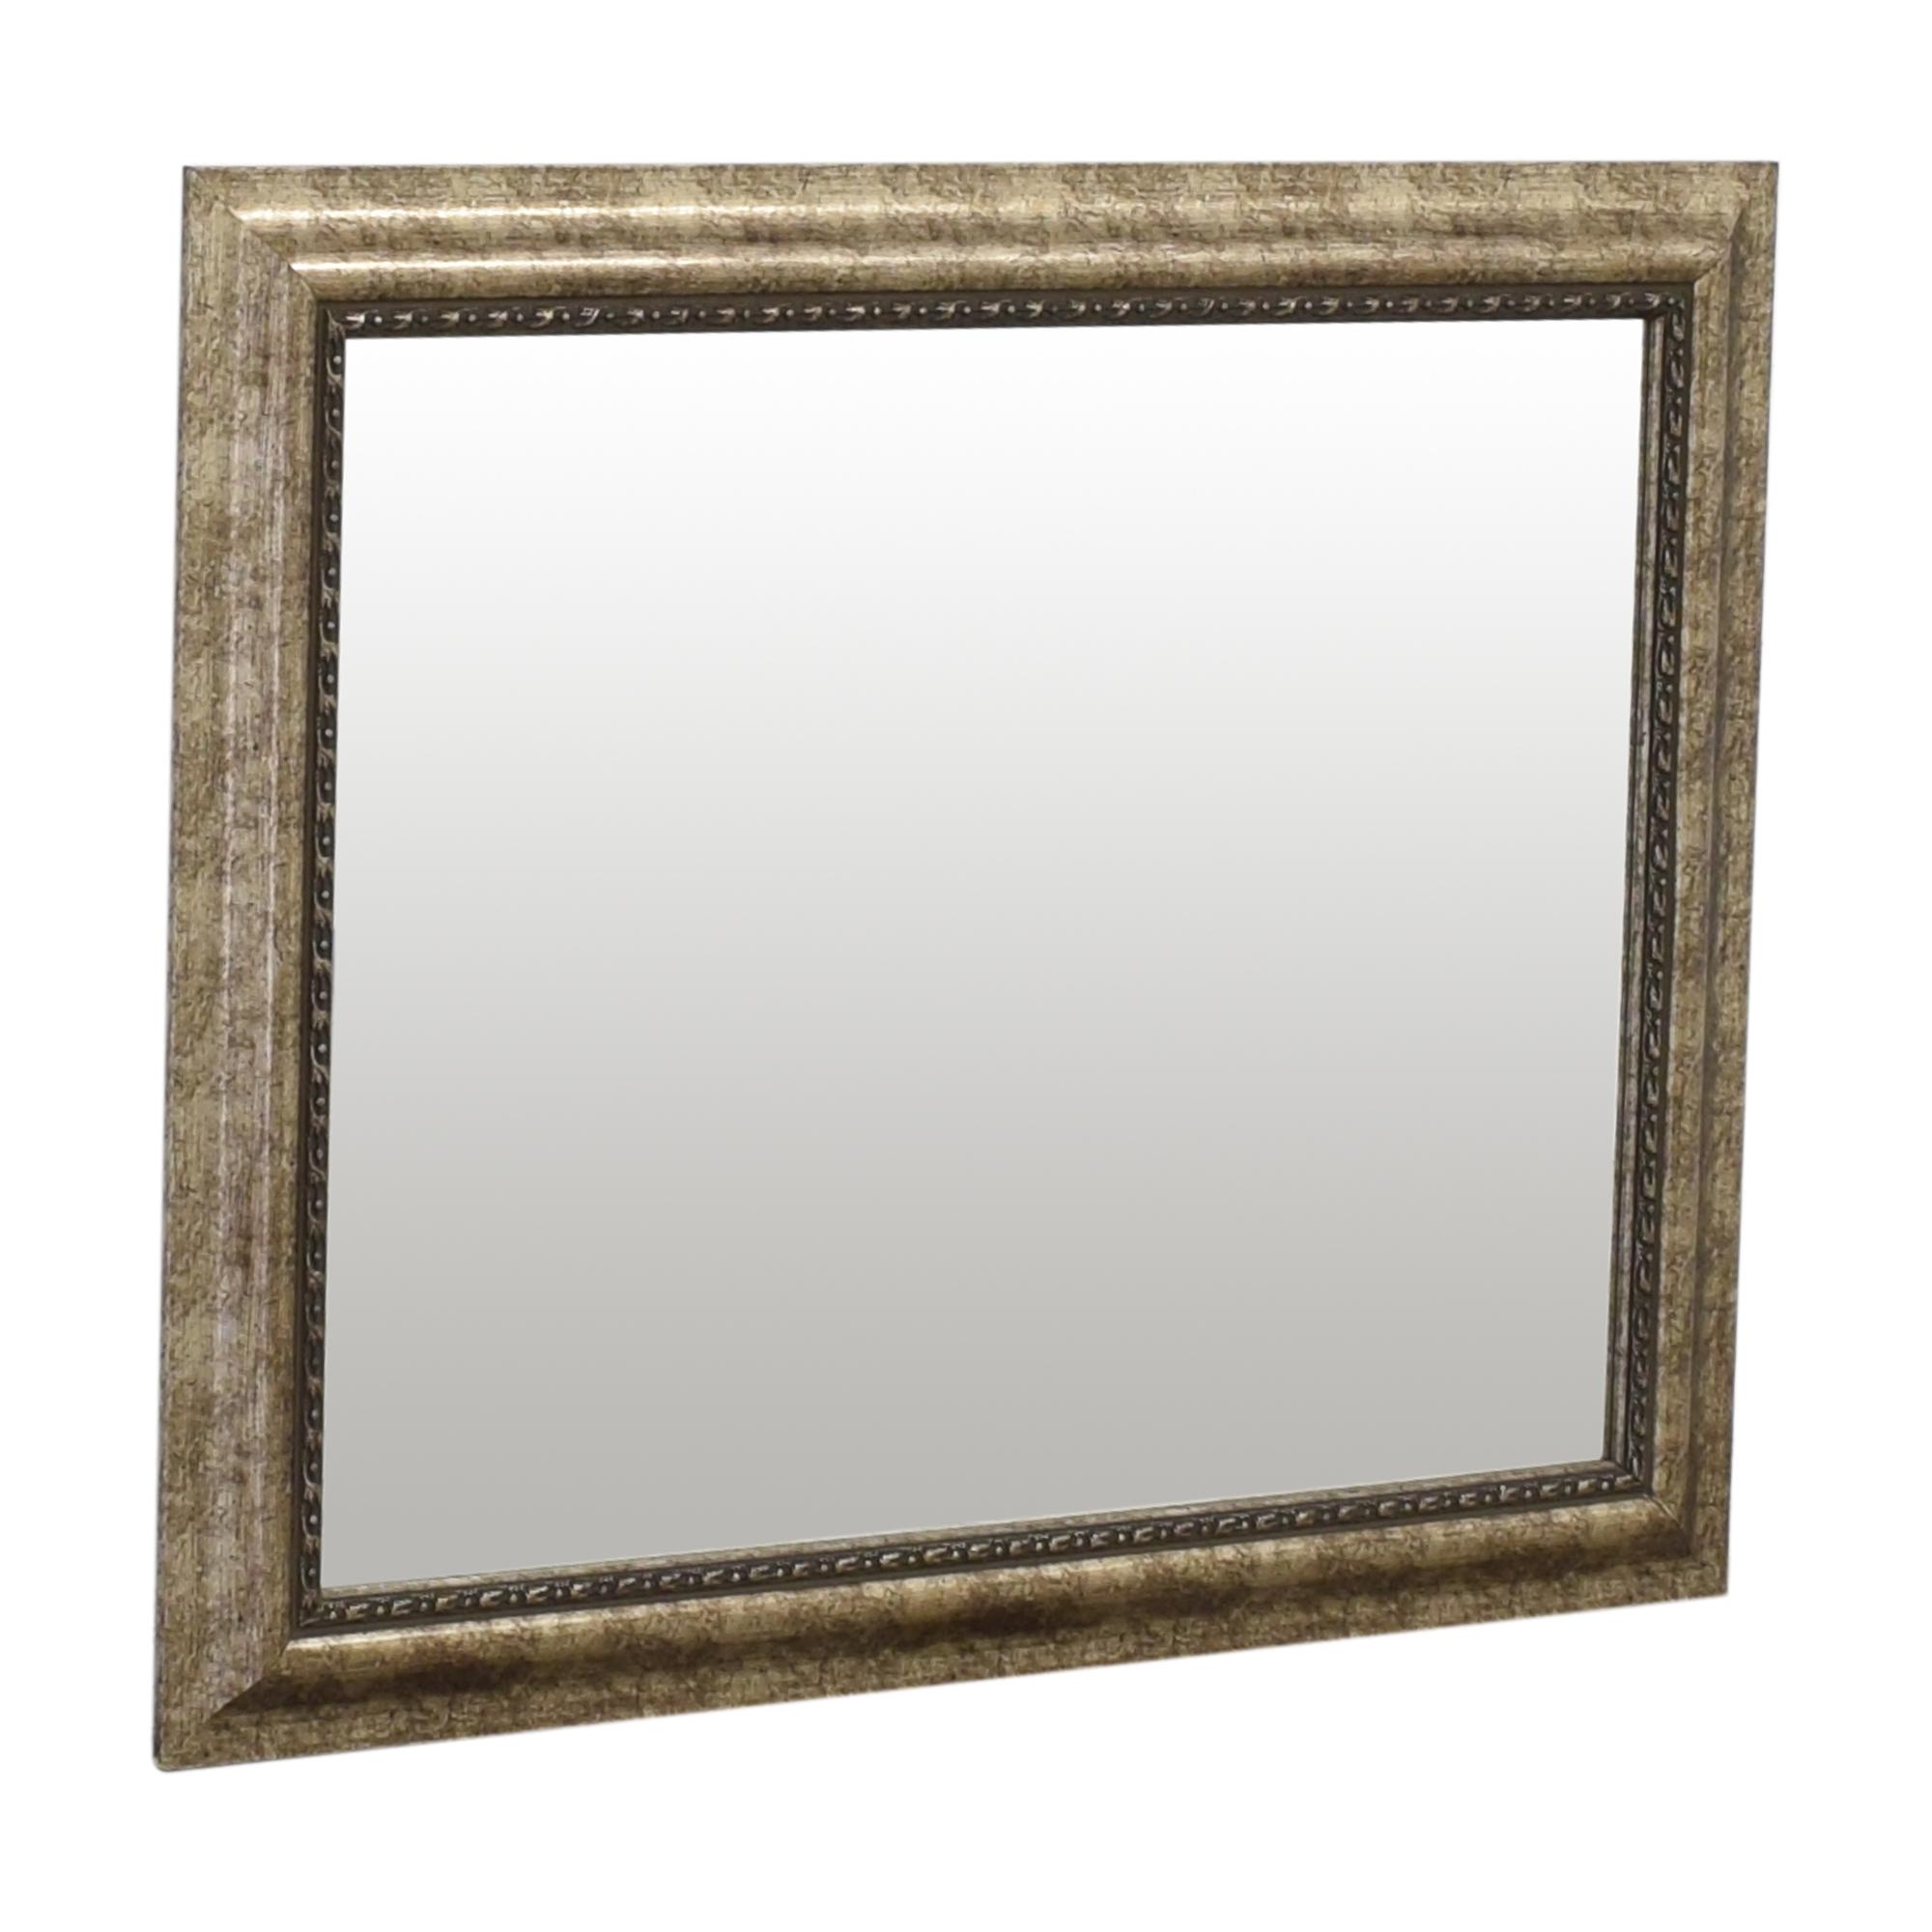 Bed Bath & Beyond Bed Bath & Beyond Framed Wall Mirror price